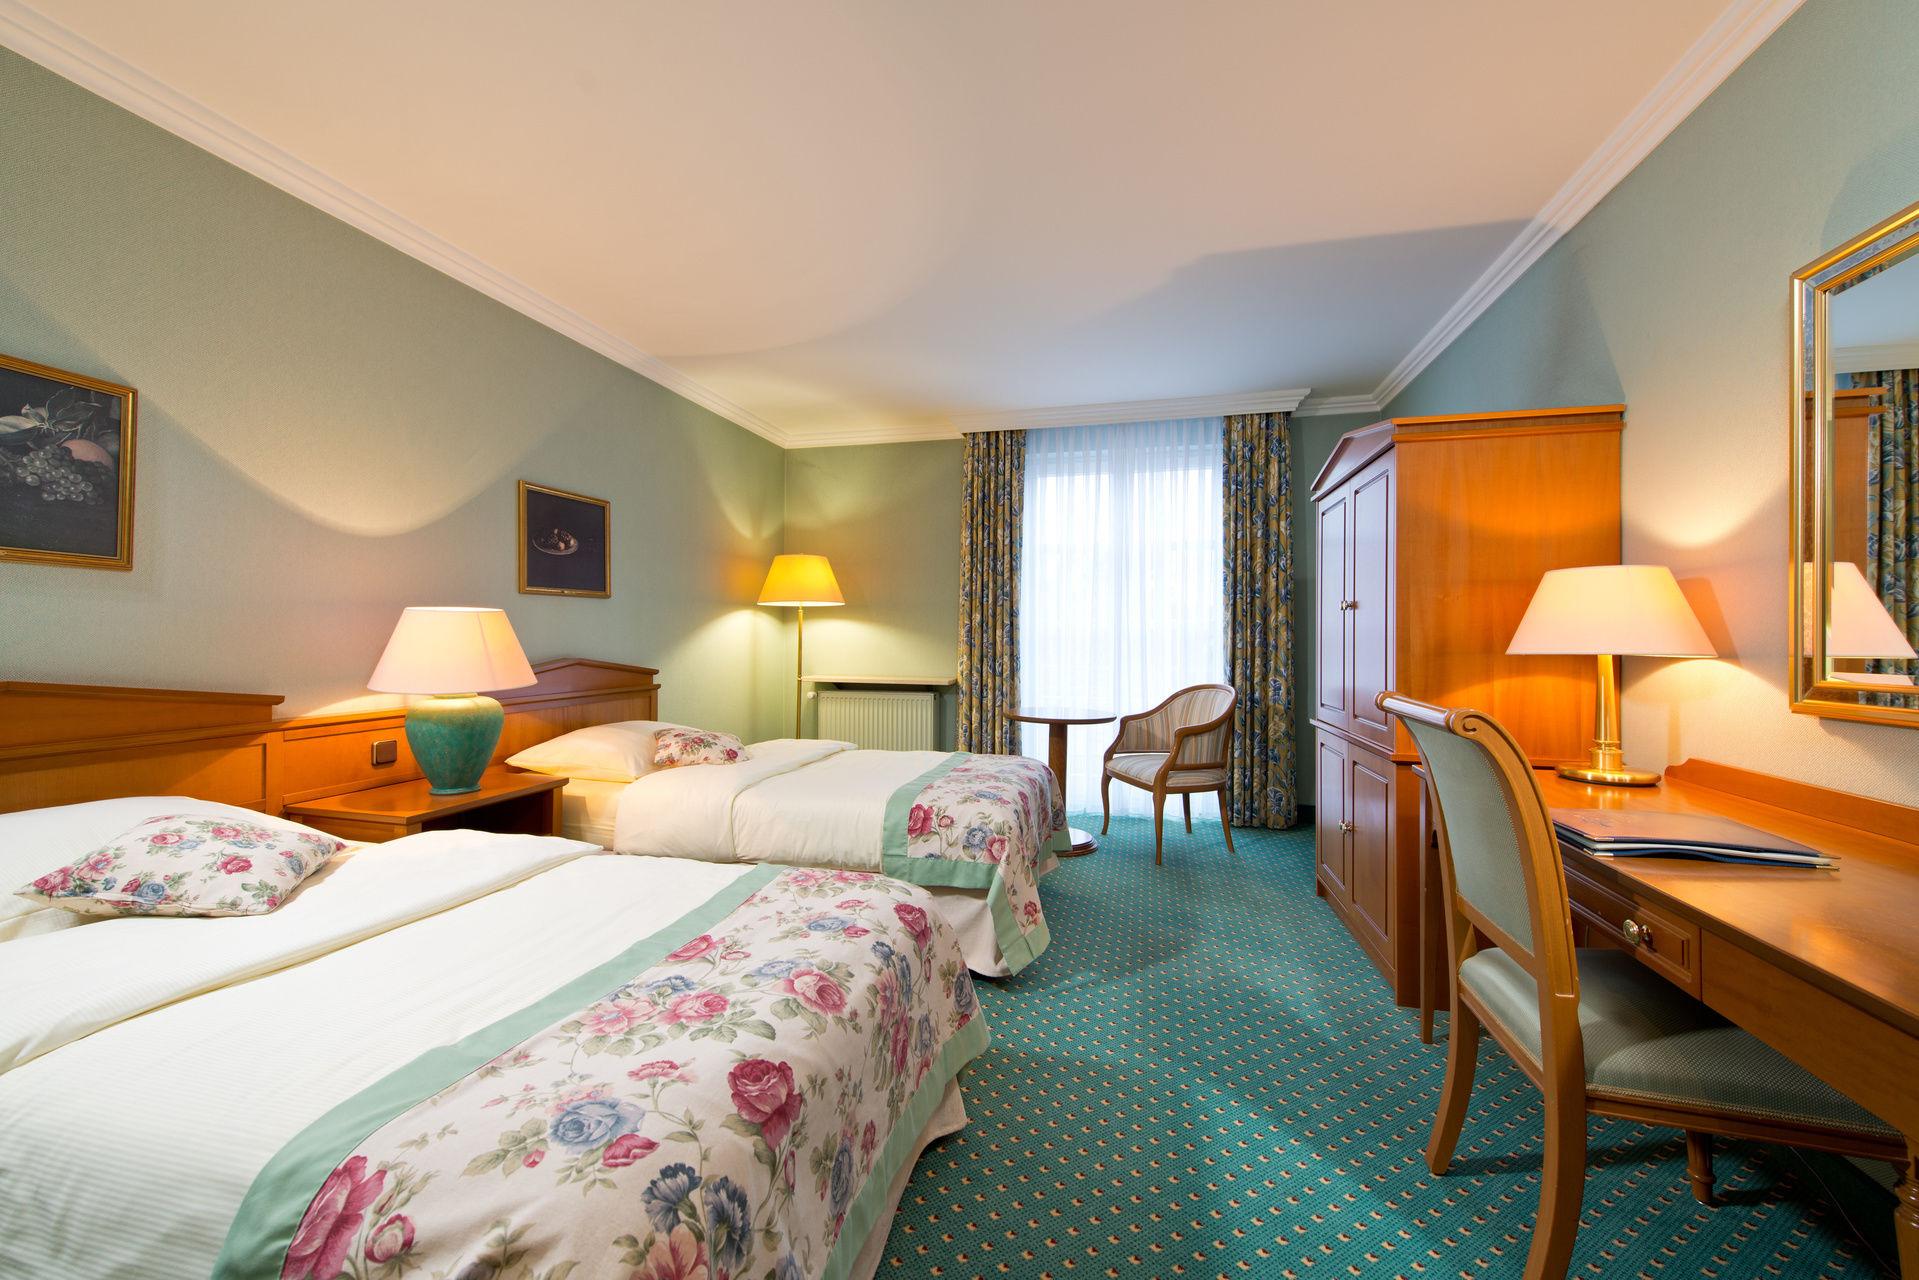 Hotel am Schlosspark Gotha Hotels Urlaub Thüringer Wald Thüringen